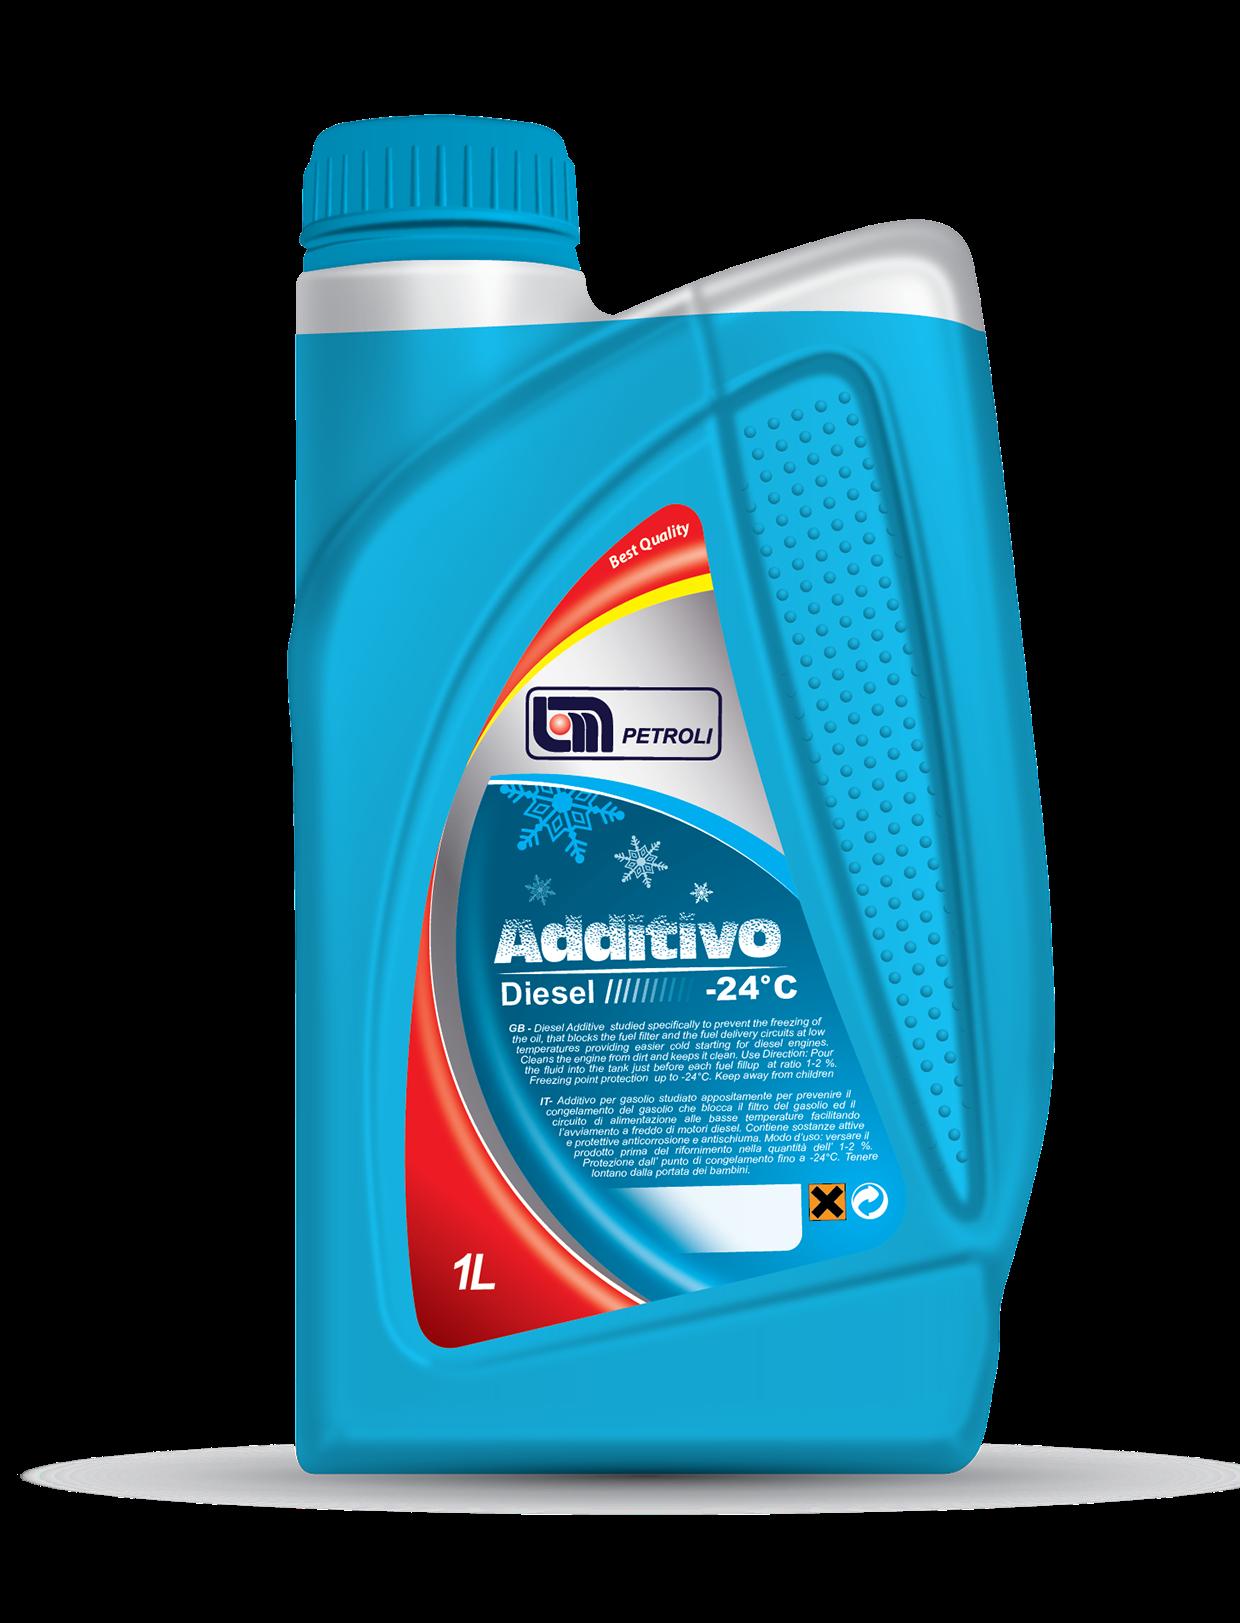 LM Petroli / Italy   oil   Label design, Packaging design